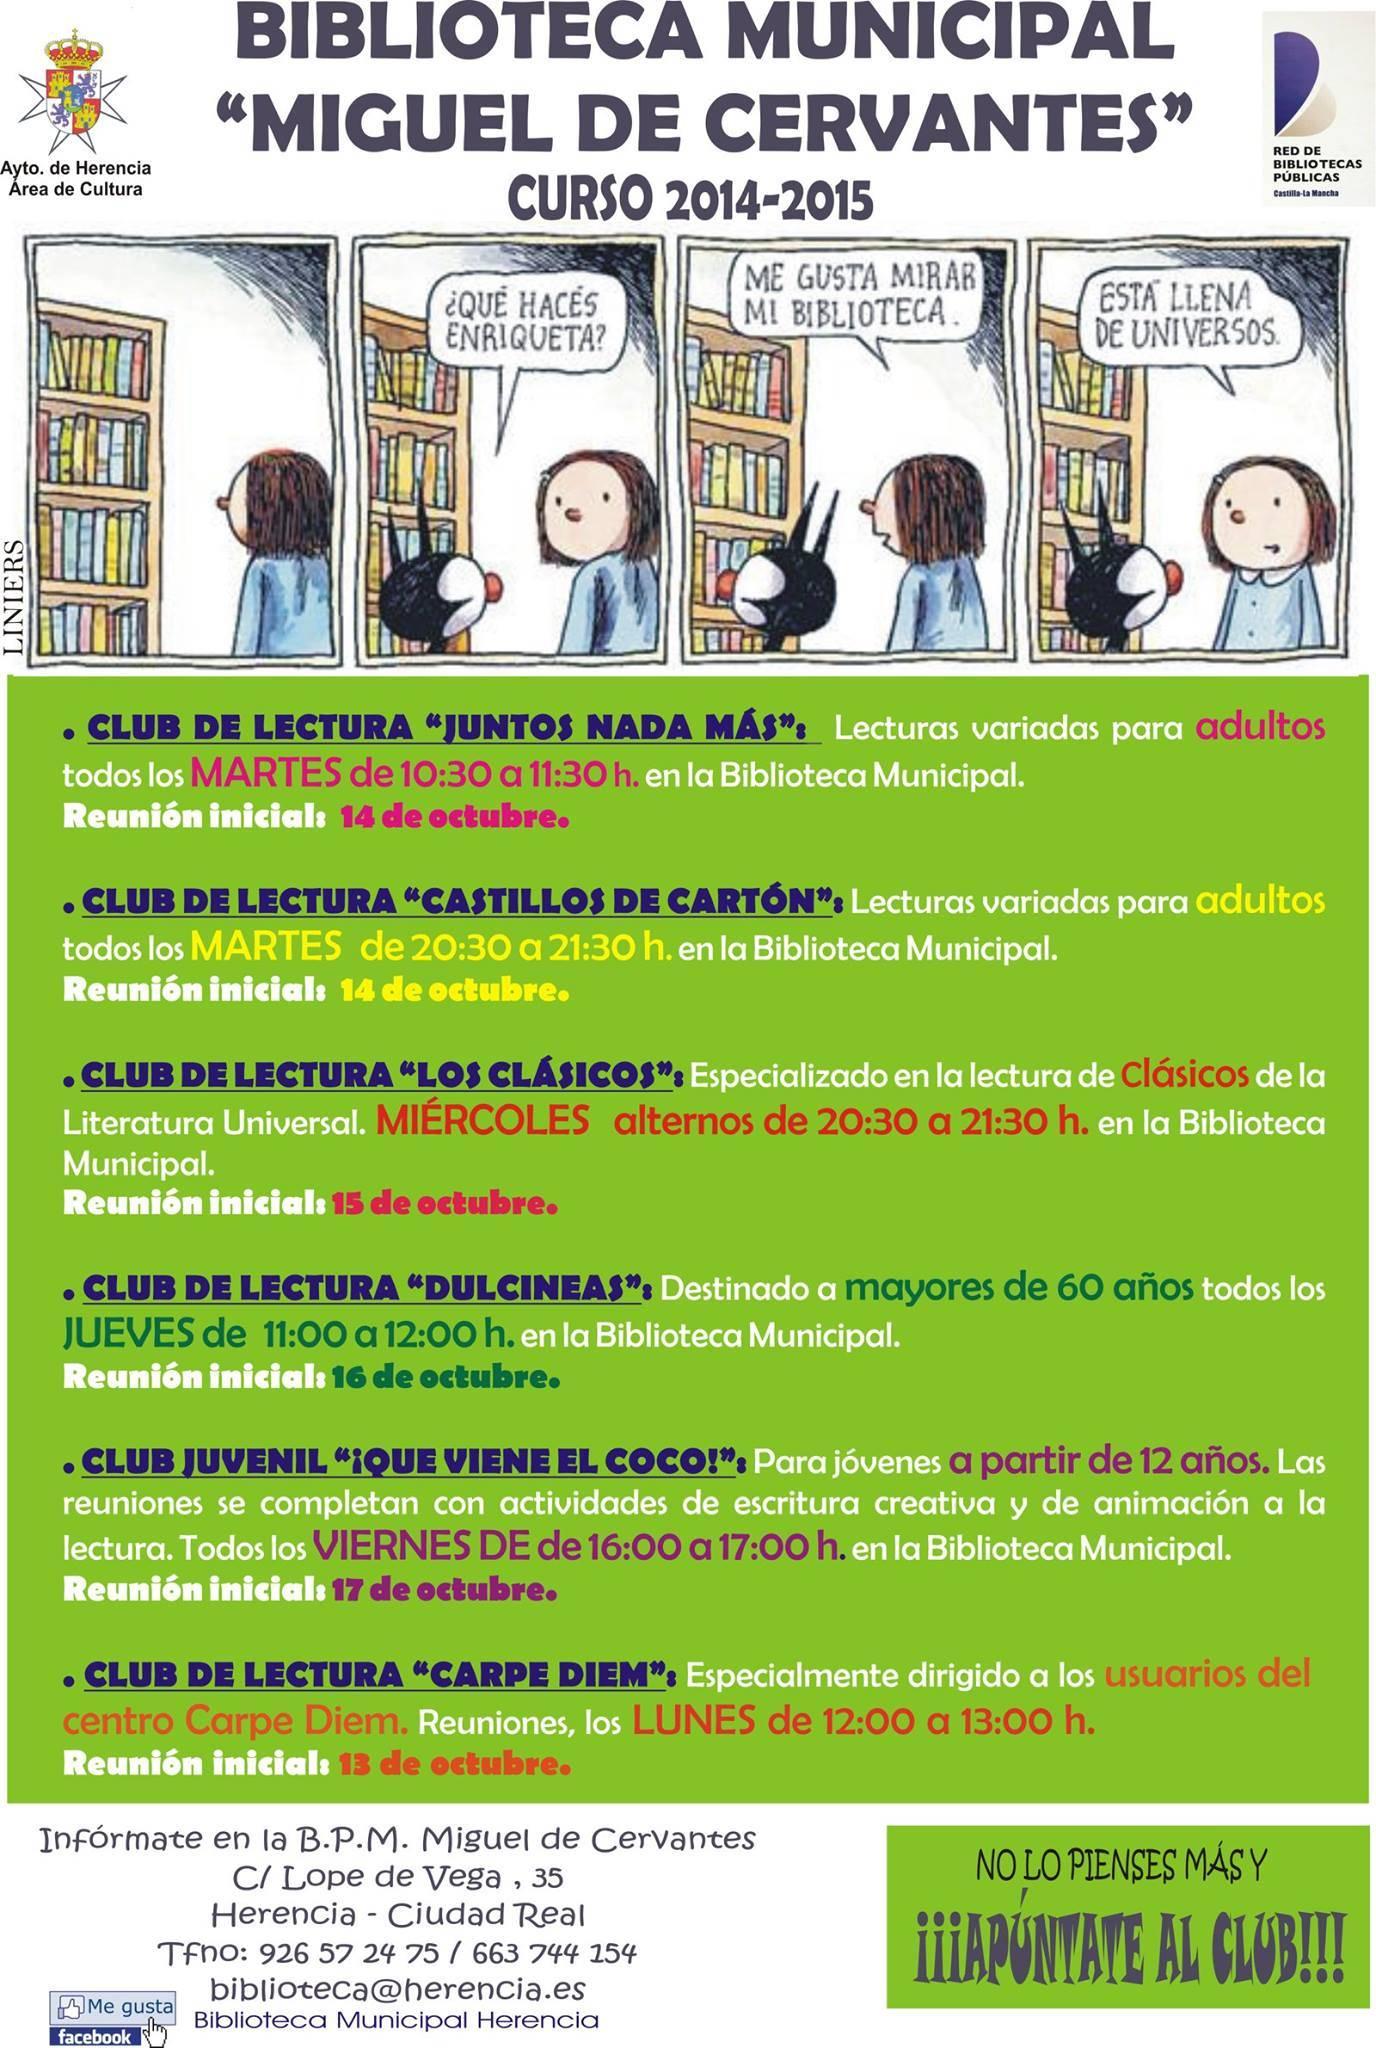 biblioteca municipal miguel de cervantes curso 2014 2105 - Abierto el curso 2014-2015 en la Biblioteca Municipal